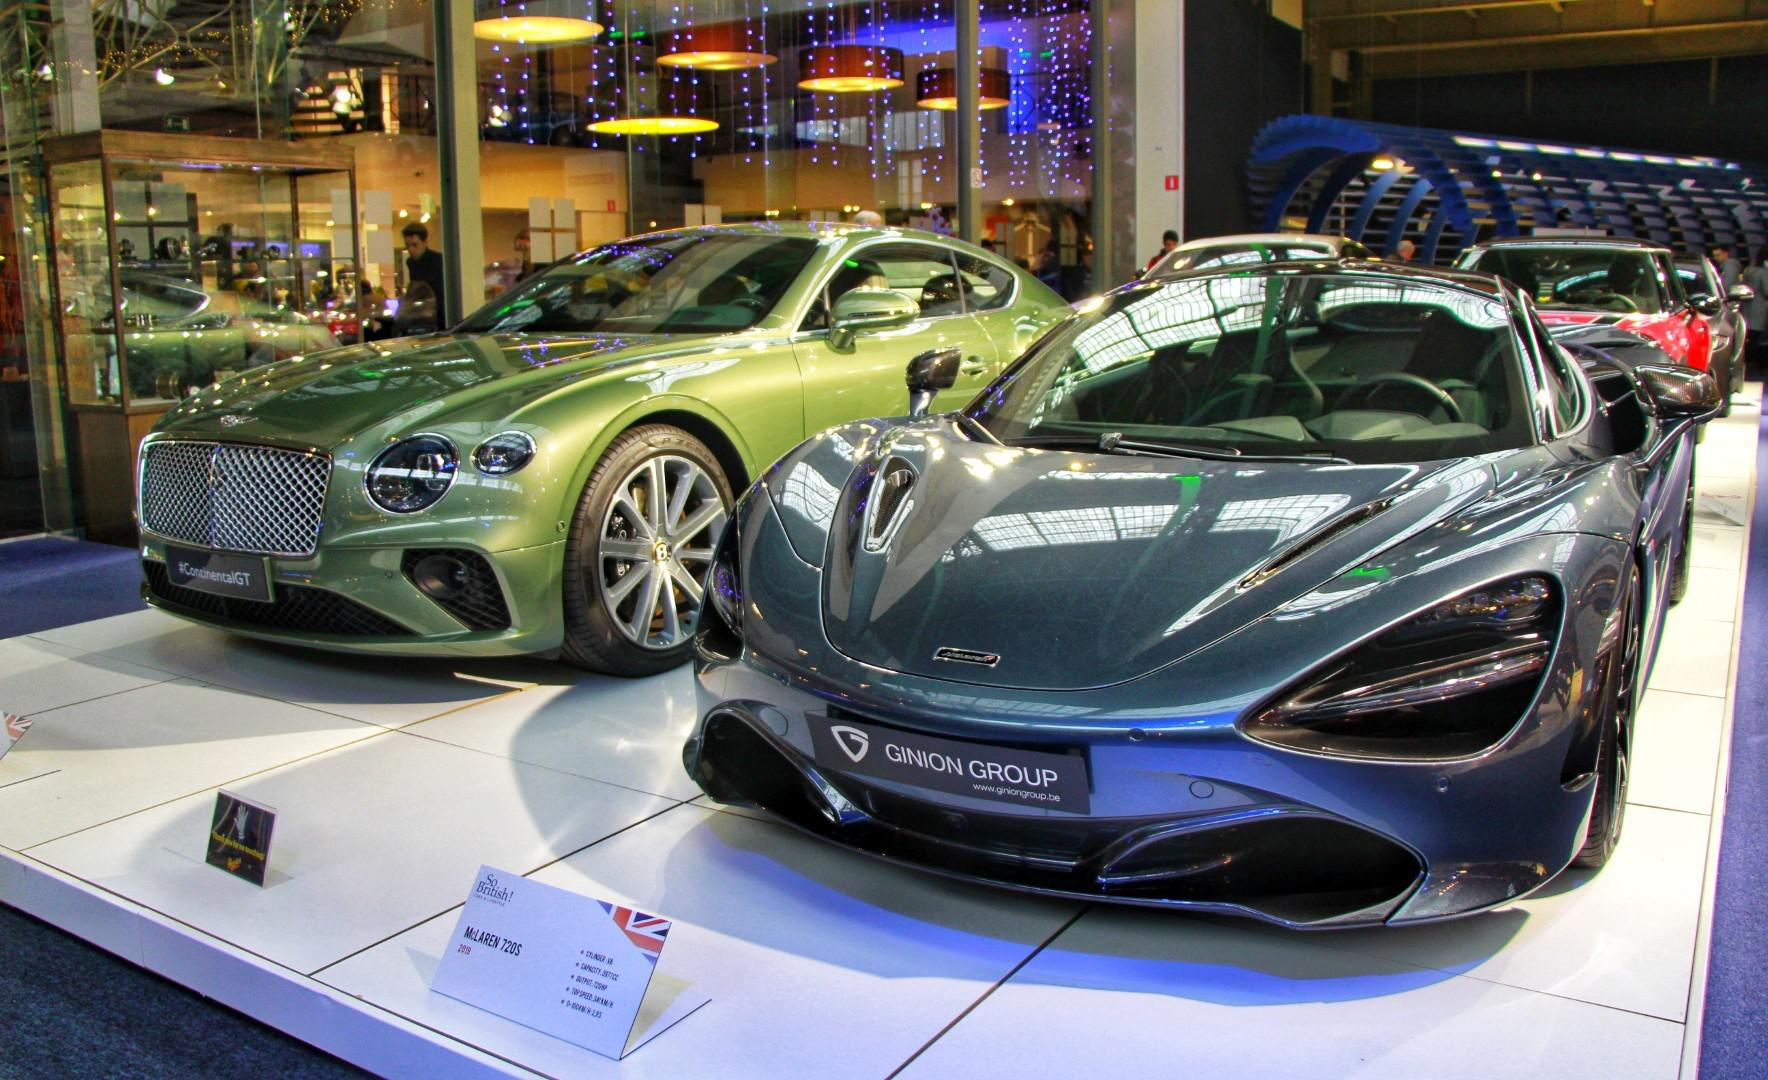 nous-avons-visite-so-british-cars-amp-lifestyle-1179-8.jpeg